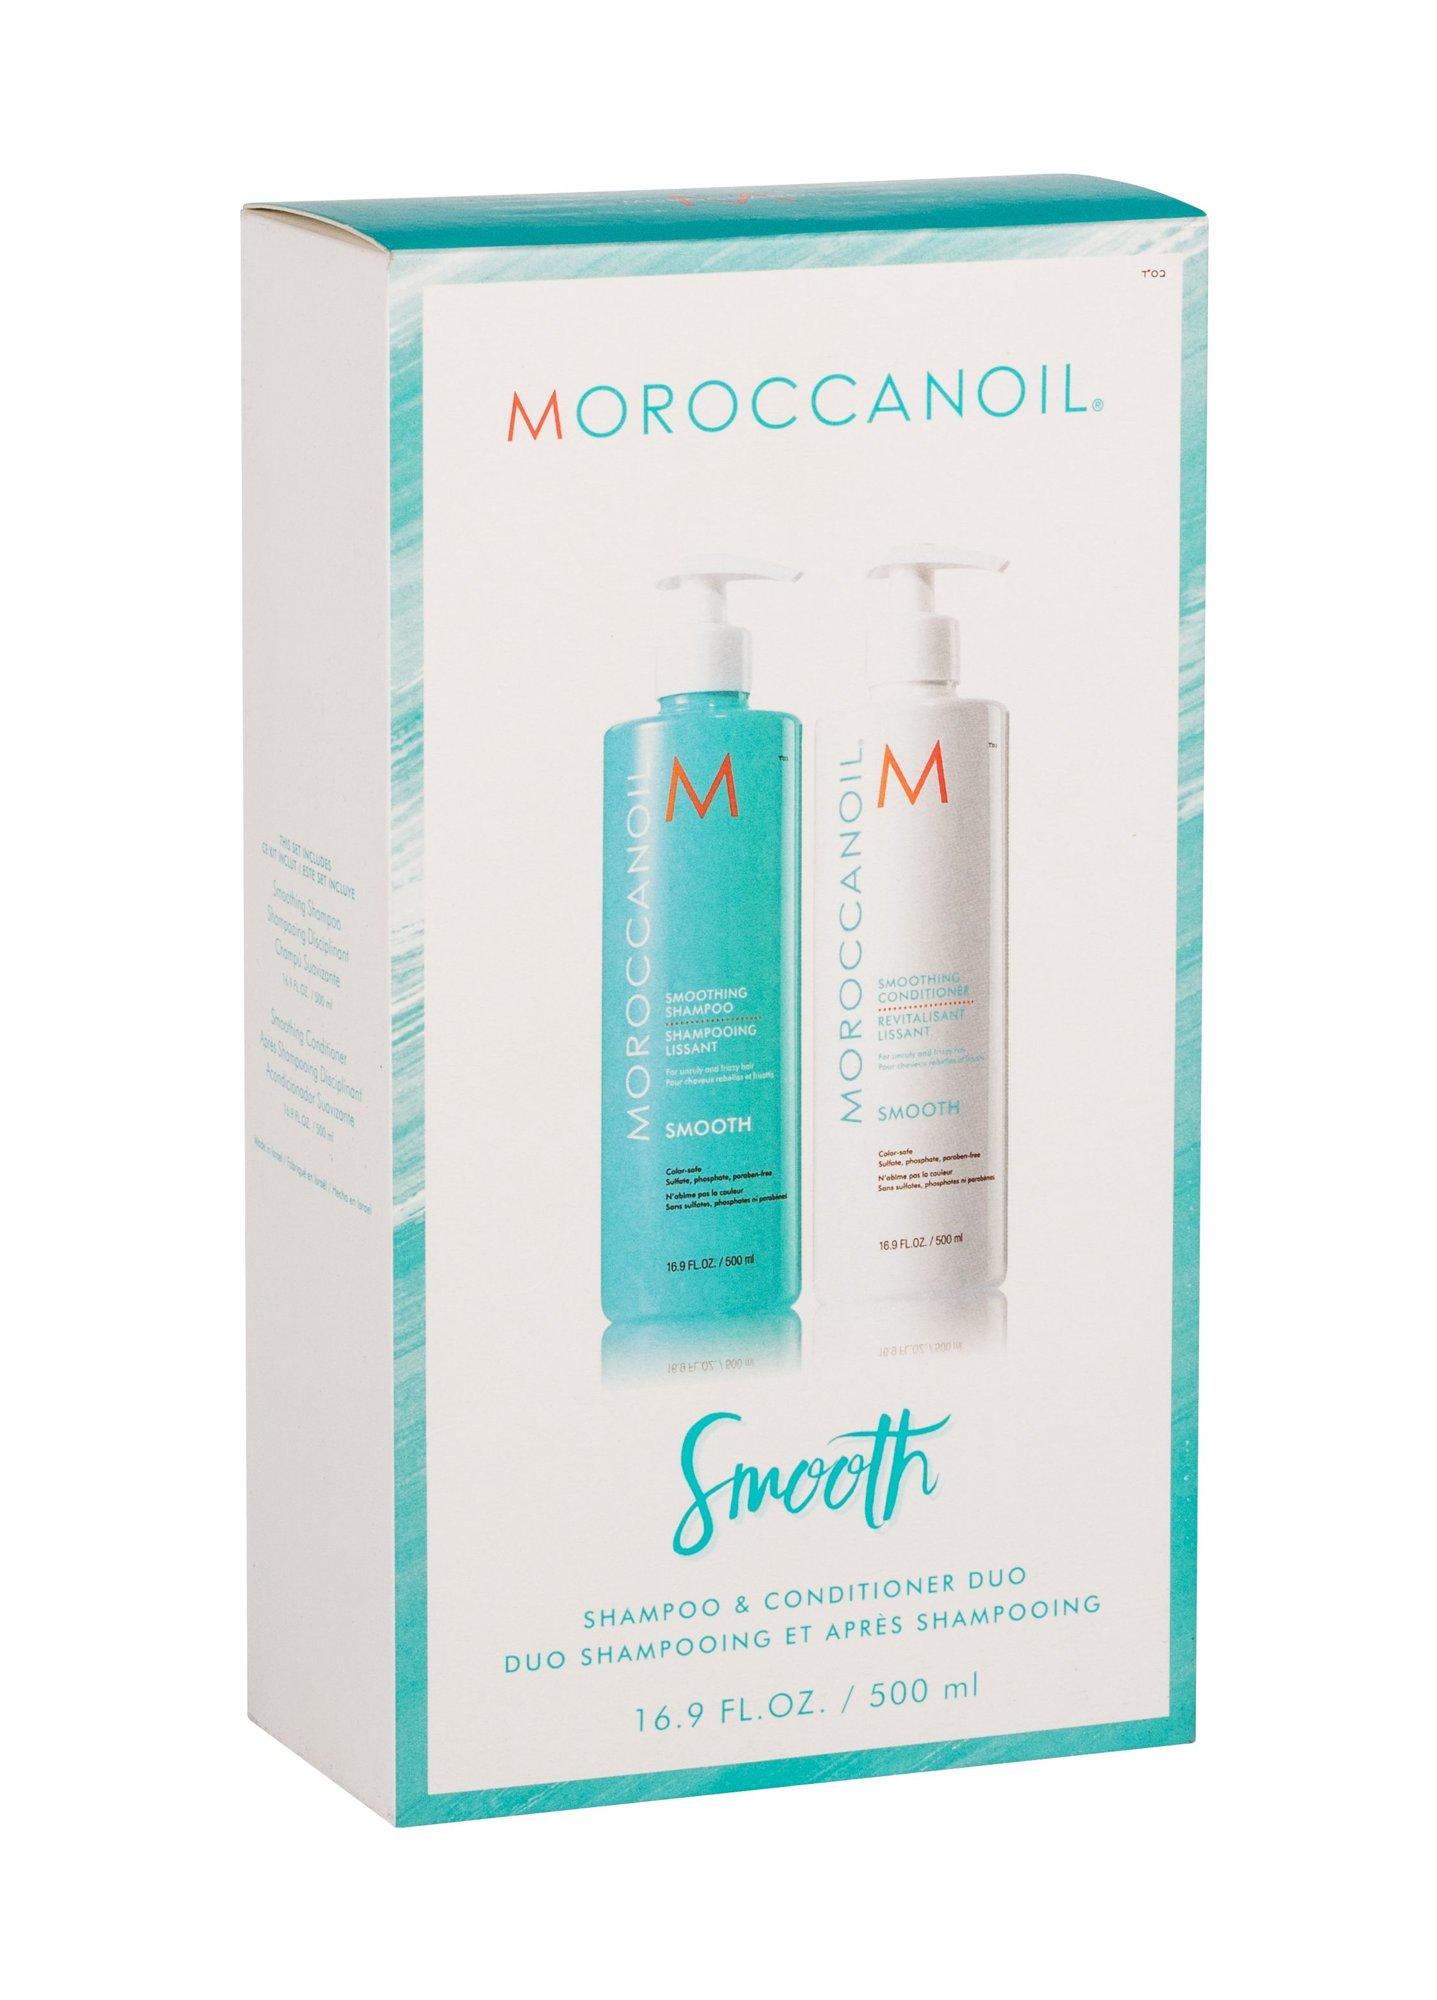 Moroccanoil Smooth Shampoo 500ml